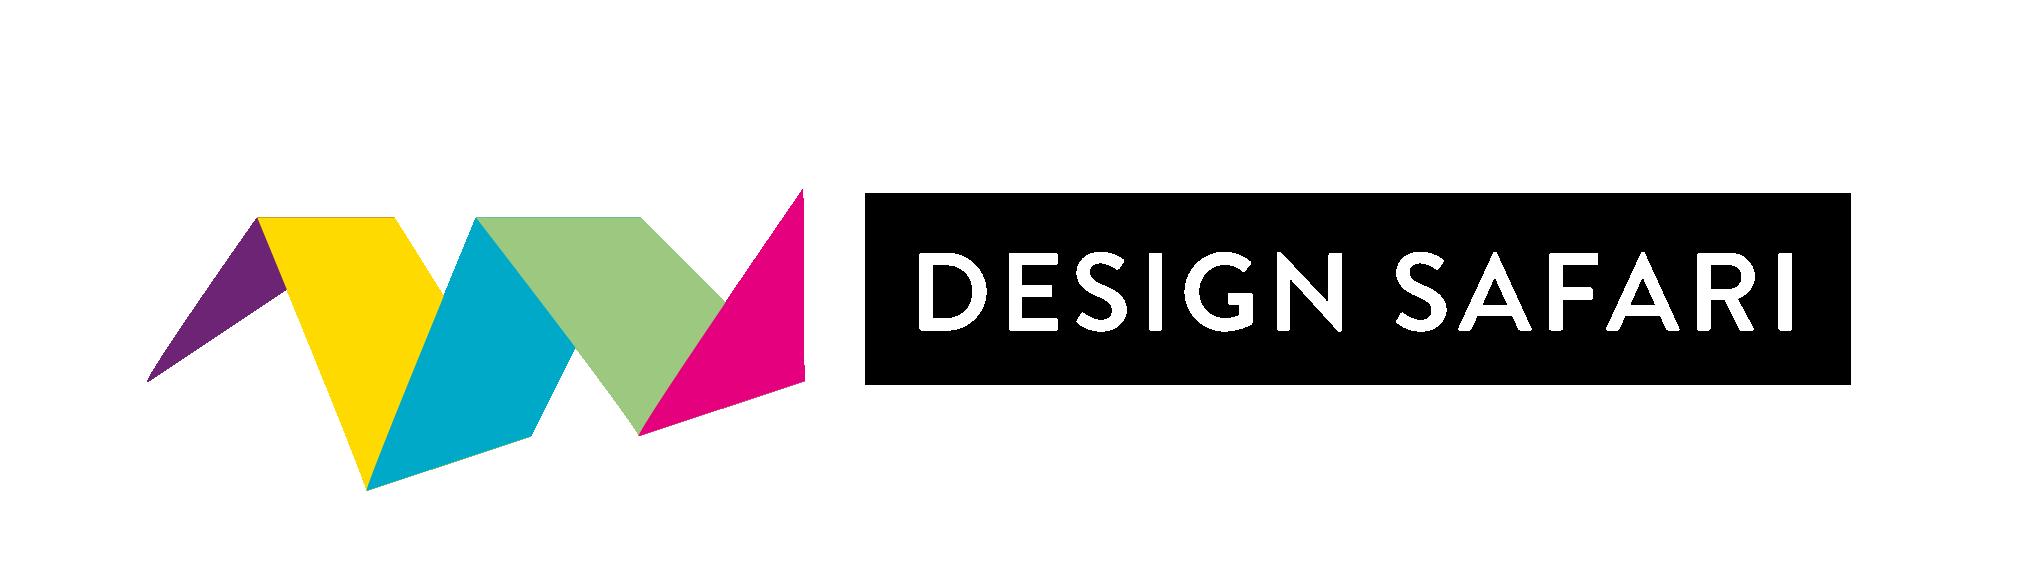 Design safari logo